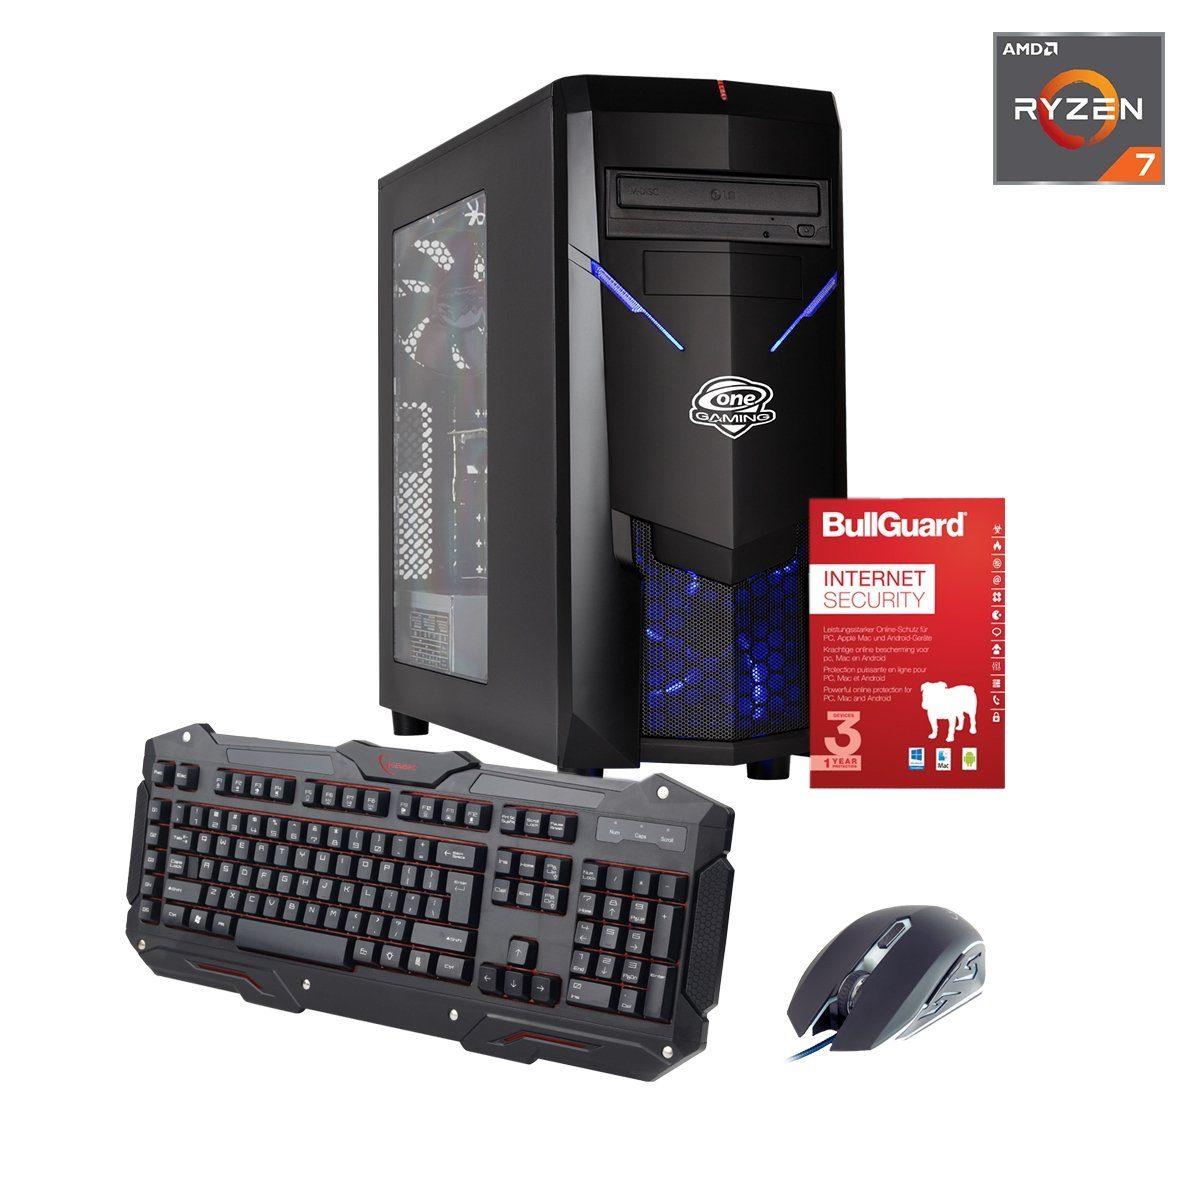 ONE GAMING PC, Ryzen 7 2700X, GeForce GTX 1070 Ti, 8GB DDR4 RAM »PC 44726«